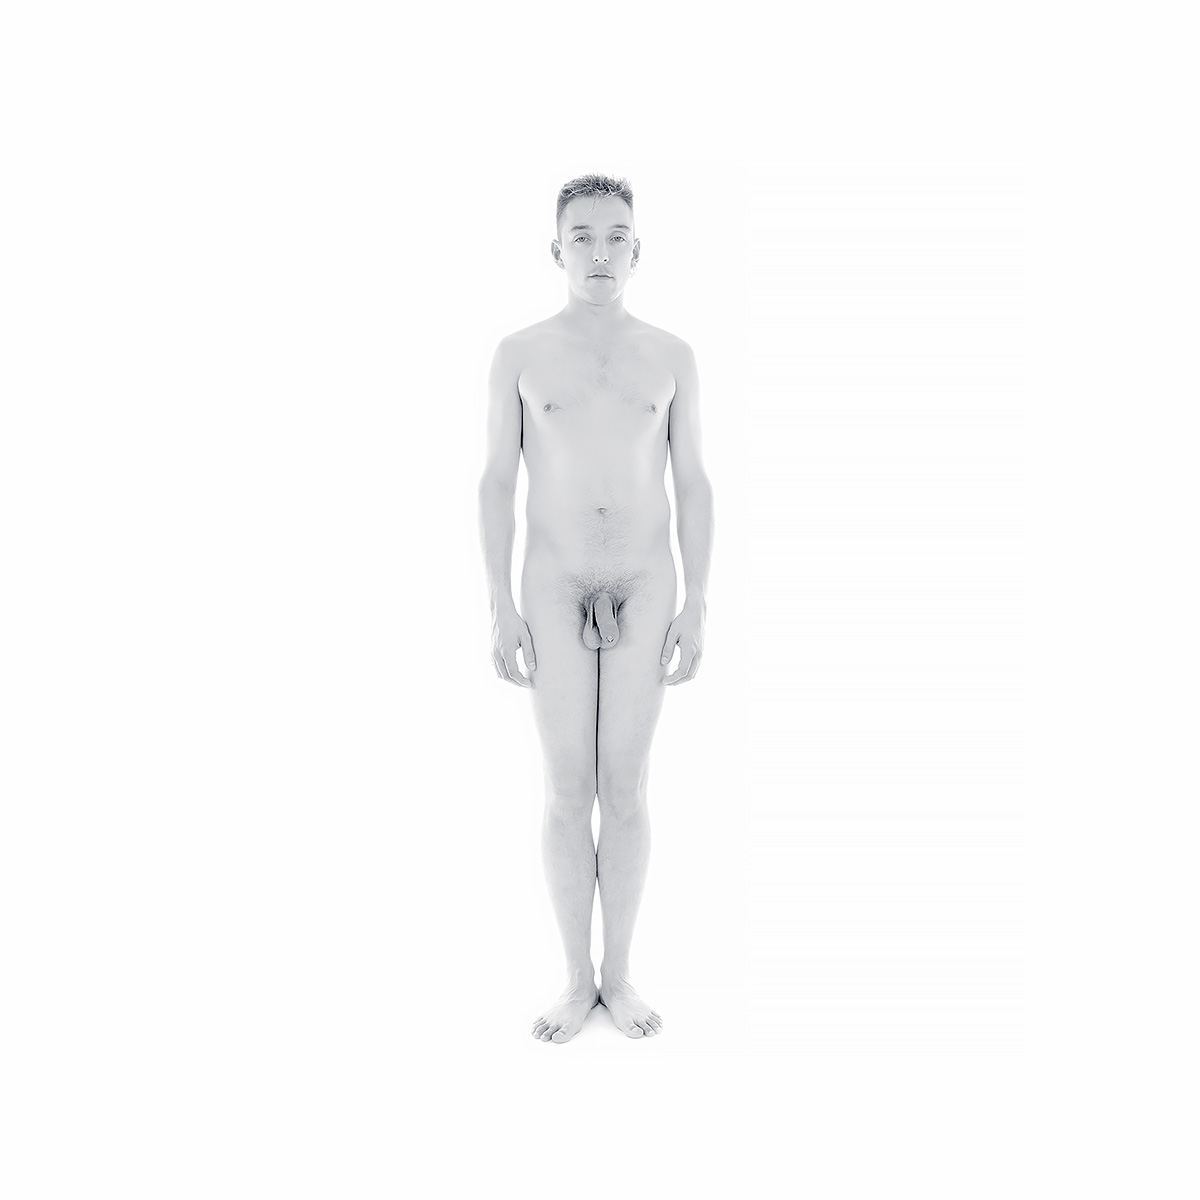 2018 The last HomoSapiens Bodies 009 tty art 1200 - 2018 - The last HomoSapiens. Bodies